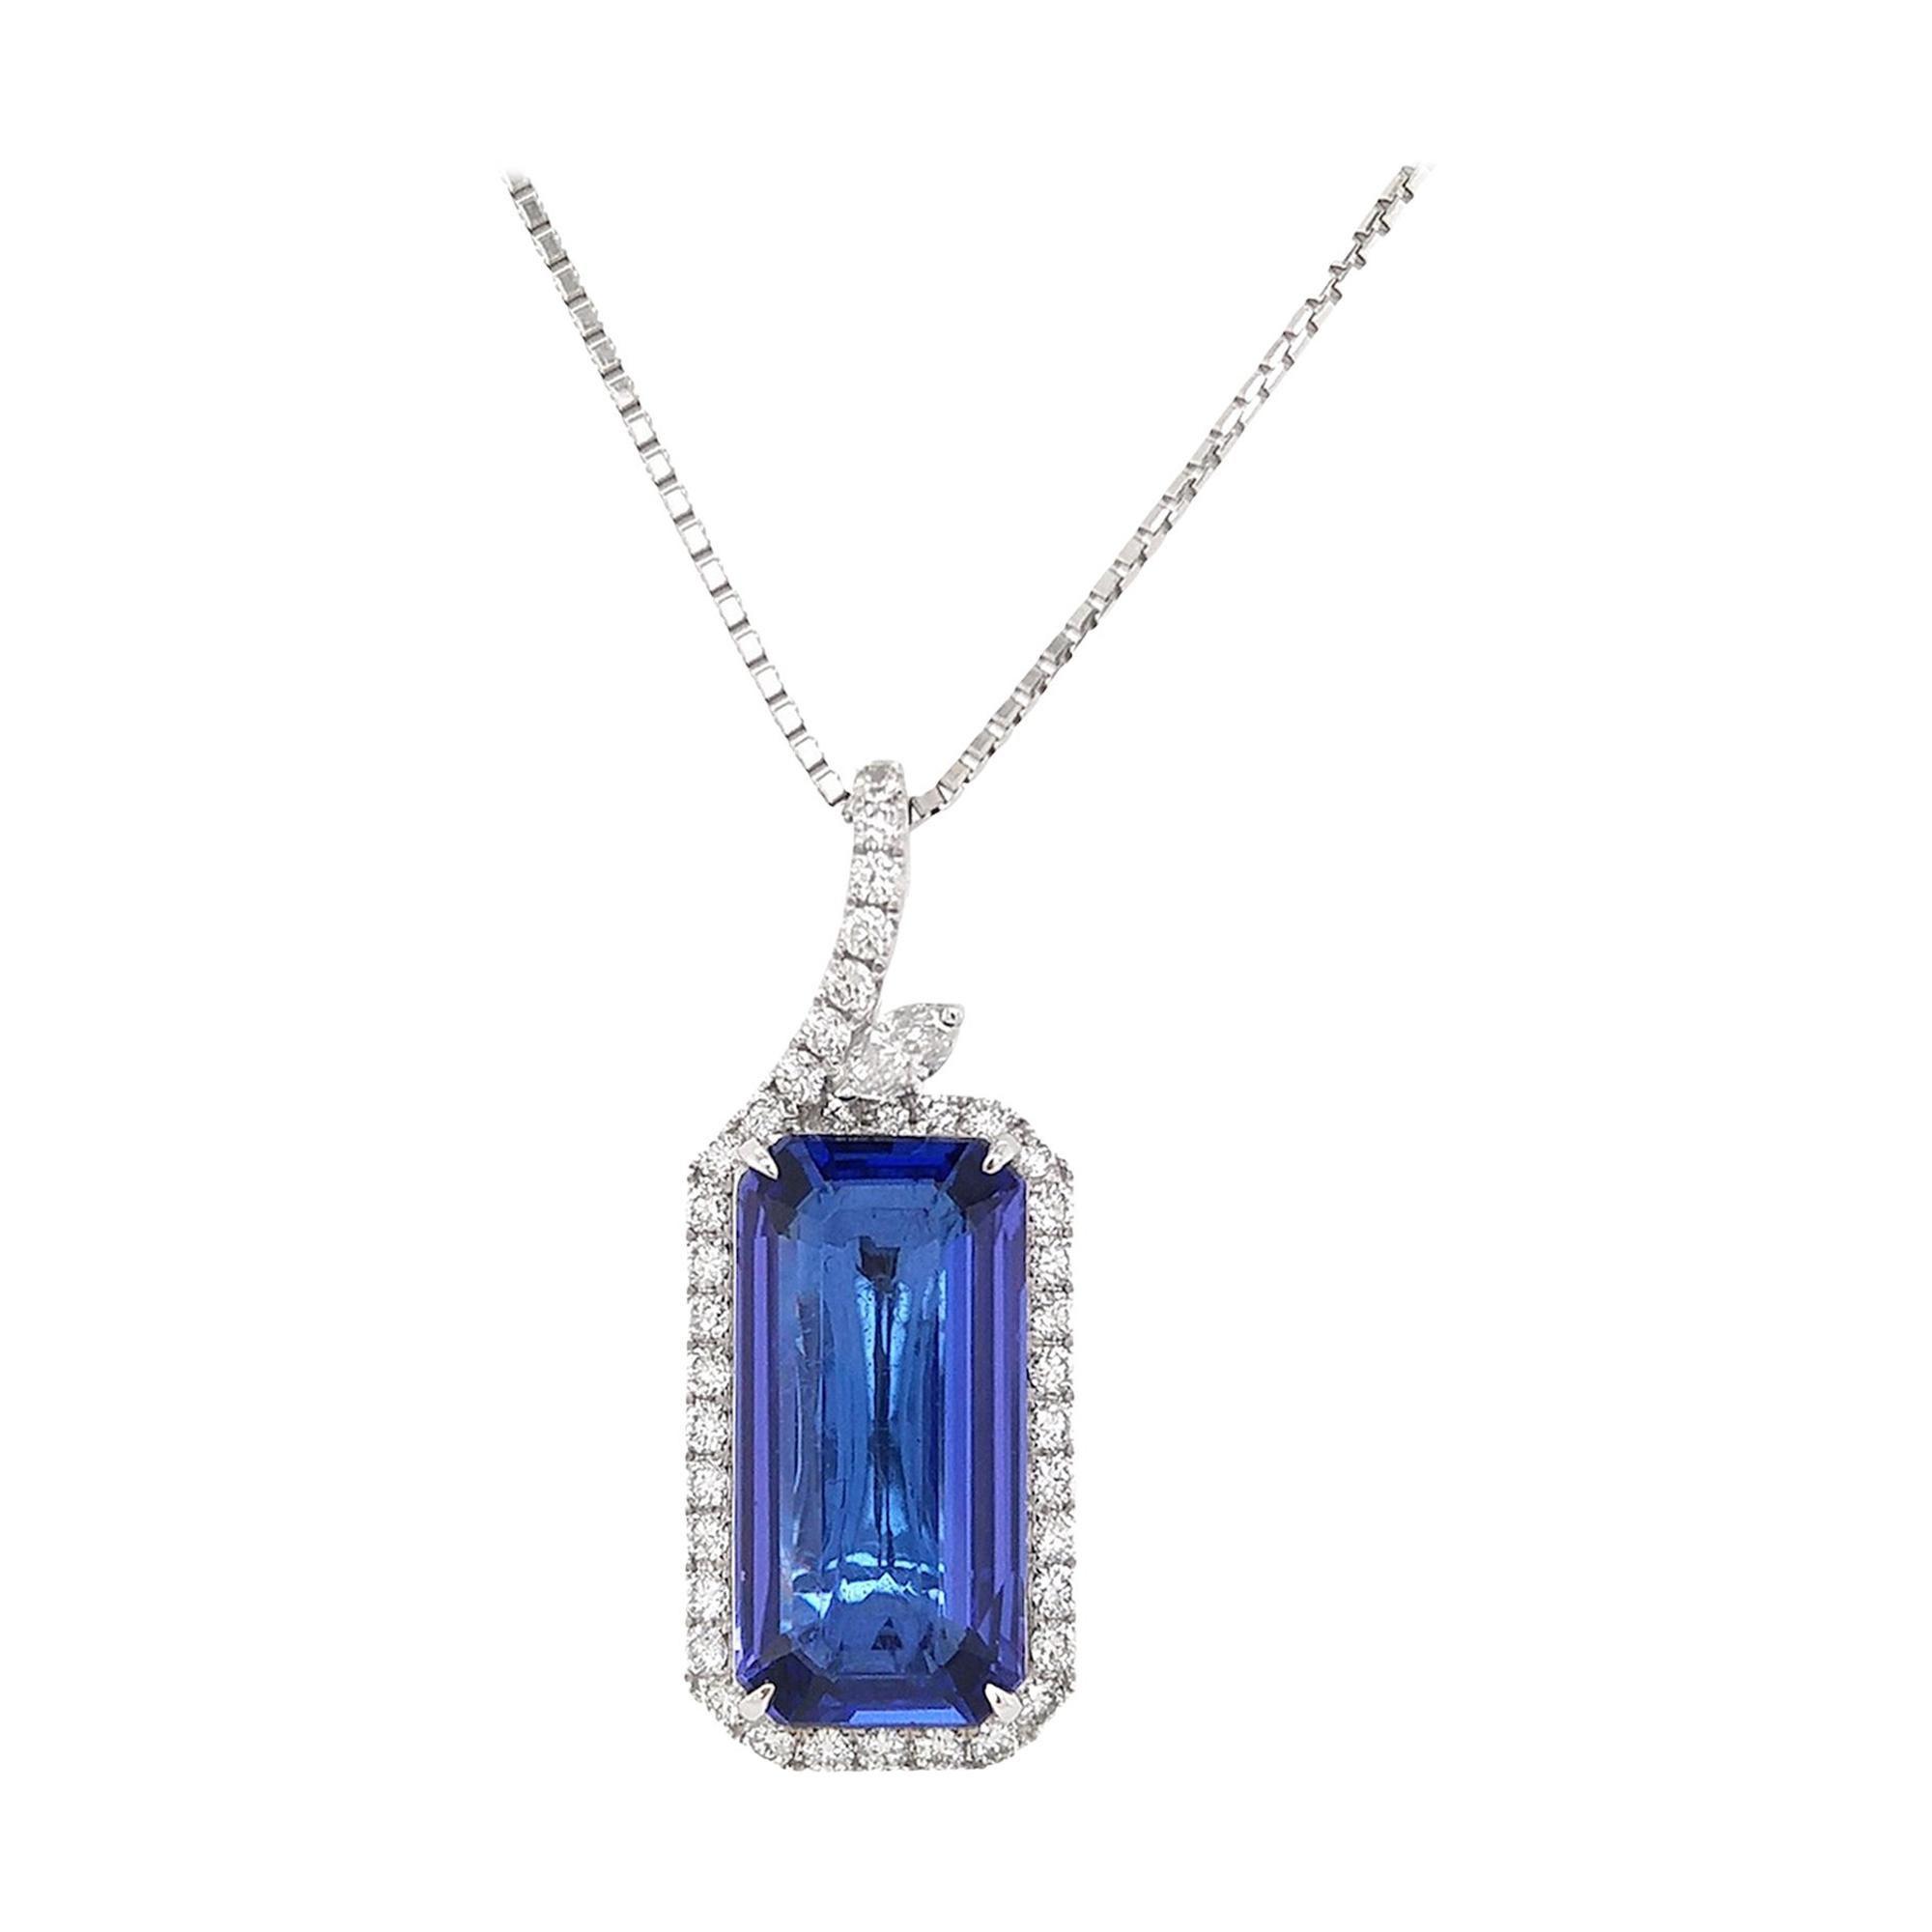 Natural Tanzanite and White Diamond in Platinum Pendant with Chain